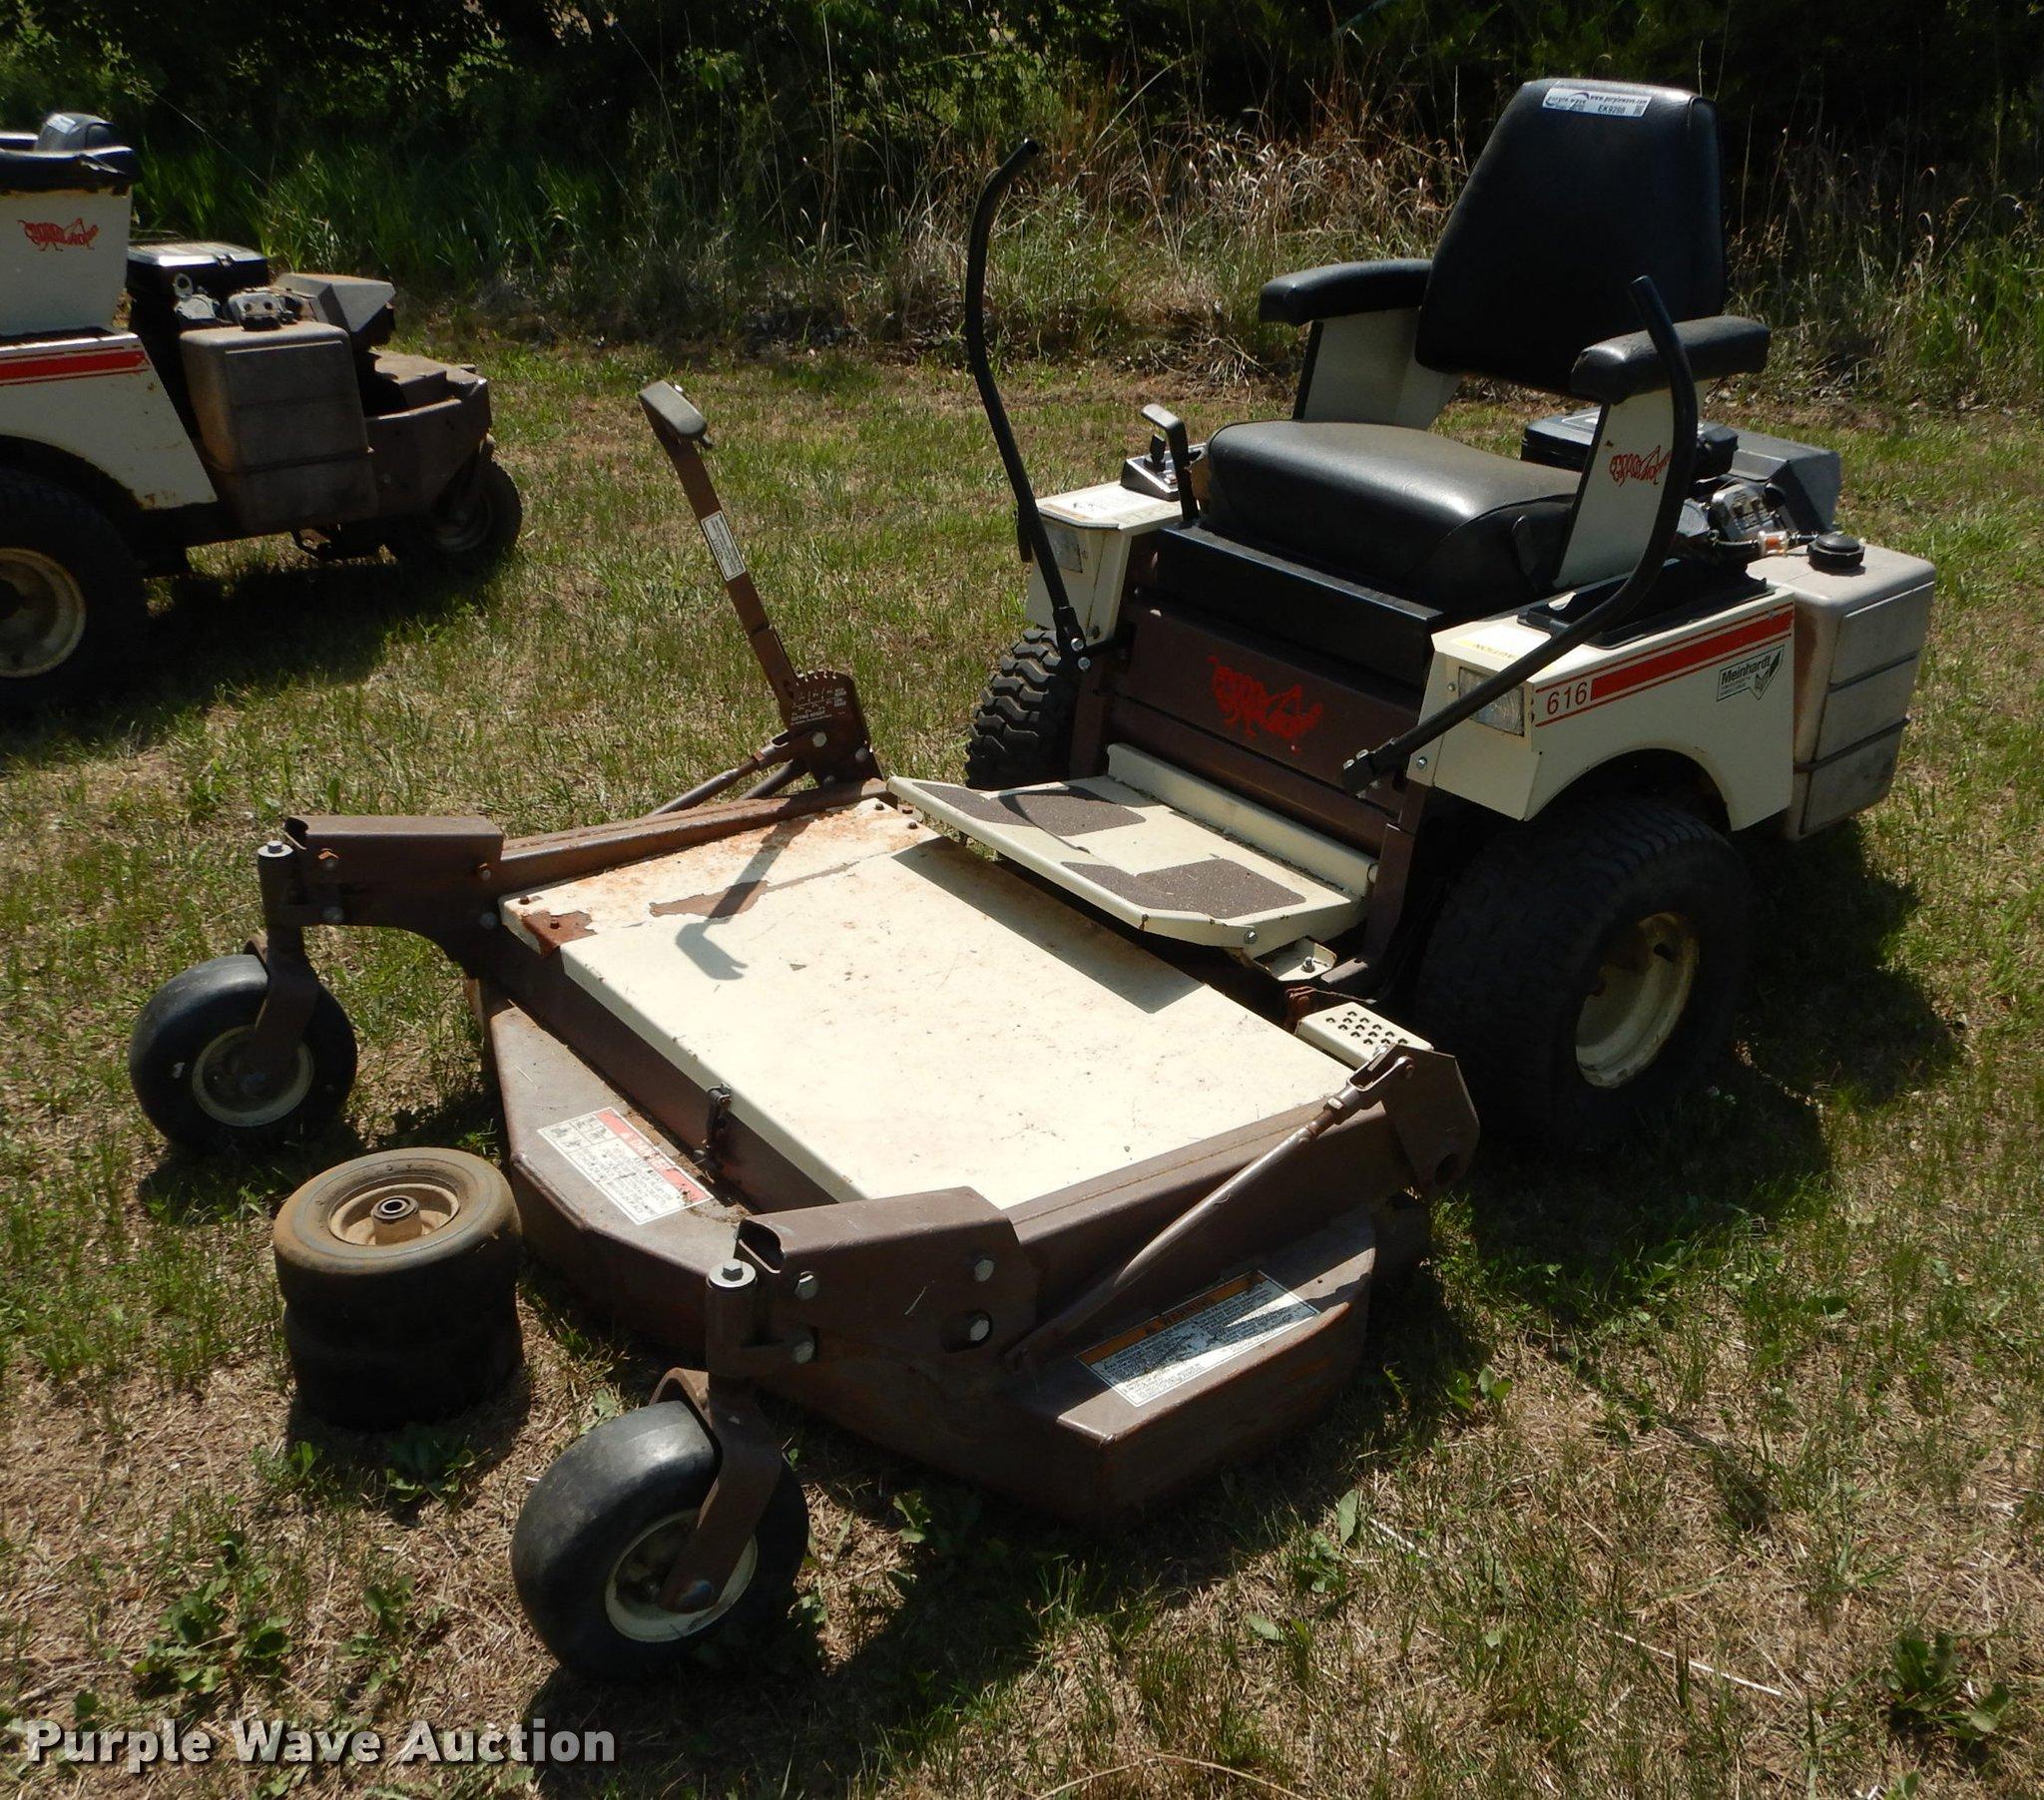 Grasshopper 616 Ztr Lawn Mower Item Ek9288 Sold June